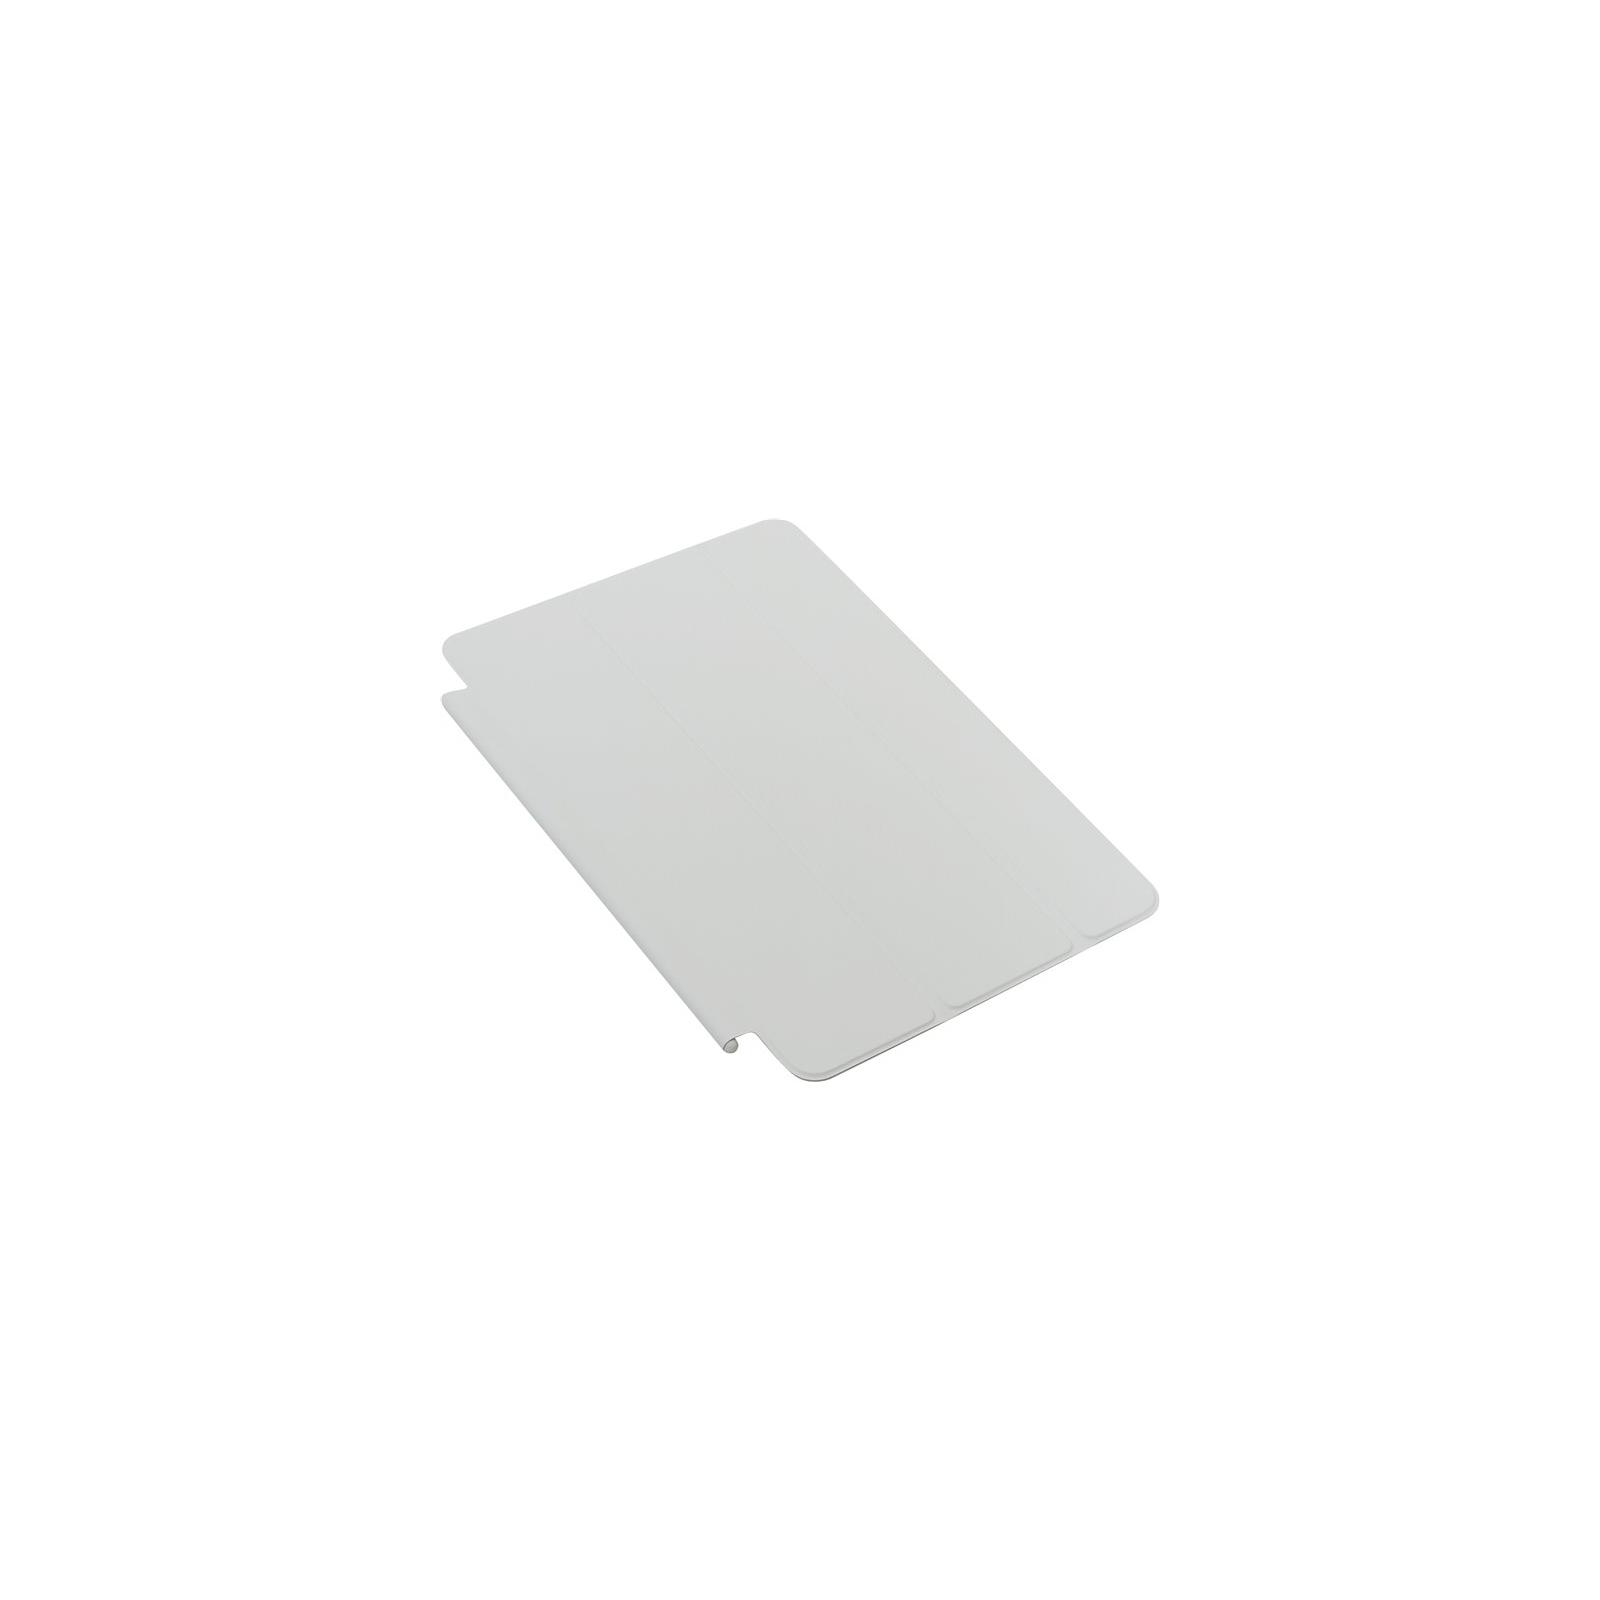 Чехол для планшета Apple Smart Cover для iPad mini 4 White (MKLW2ZM/A) изображение 5